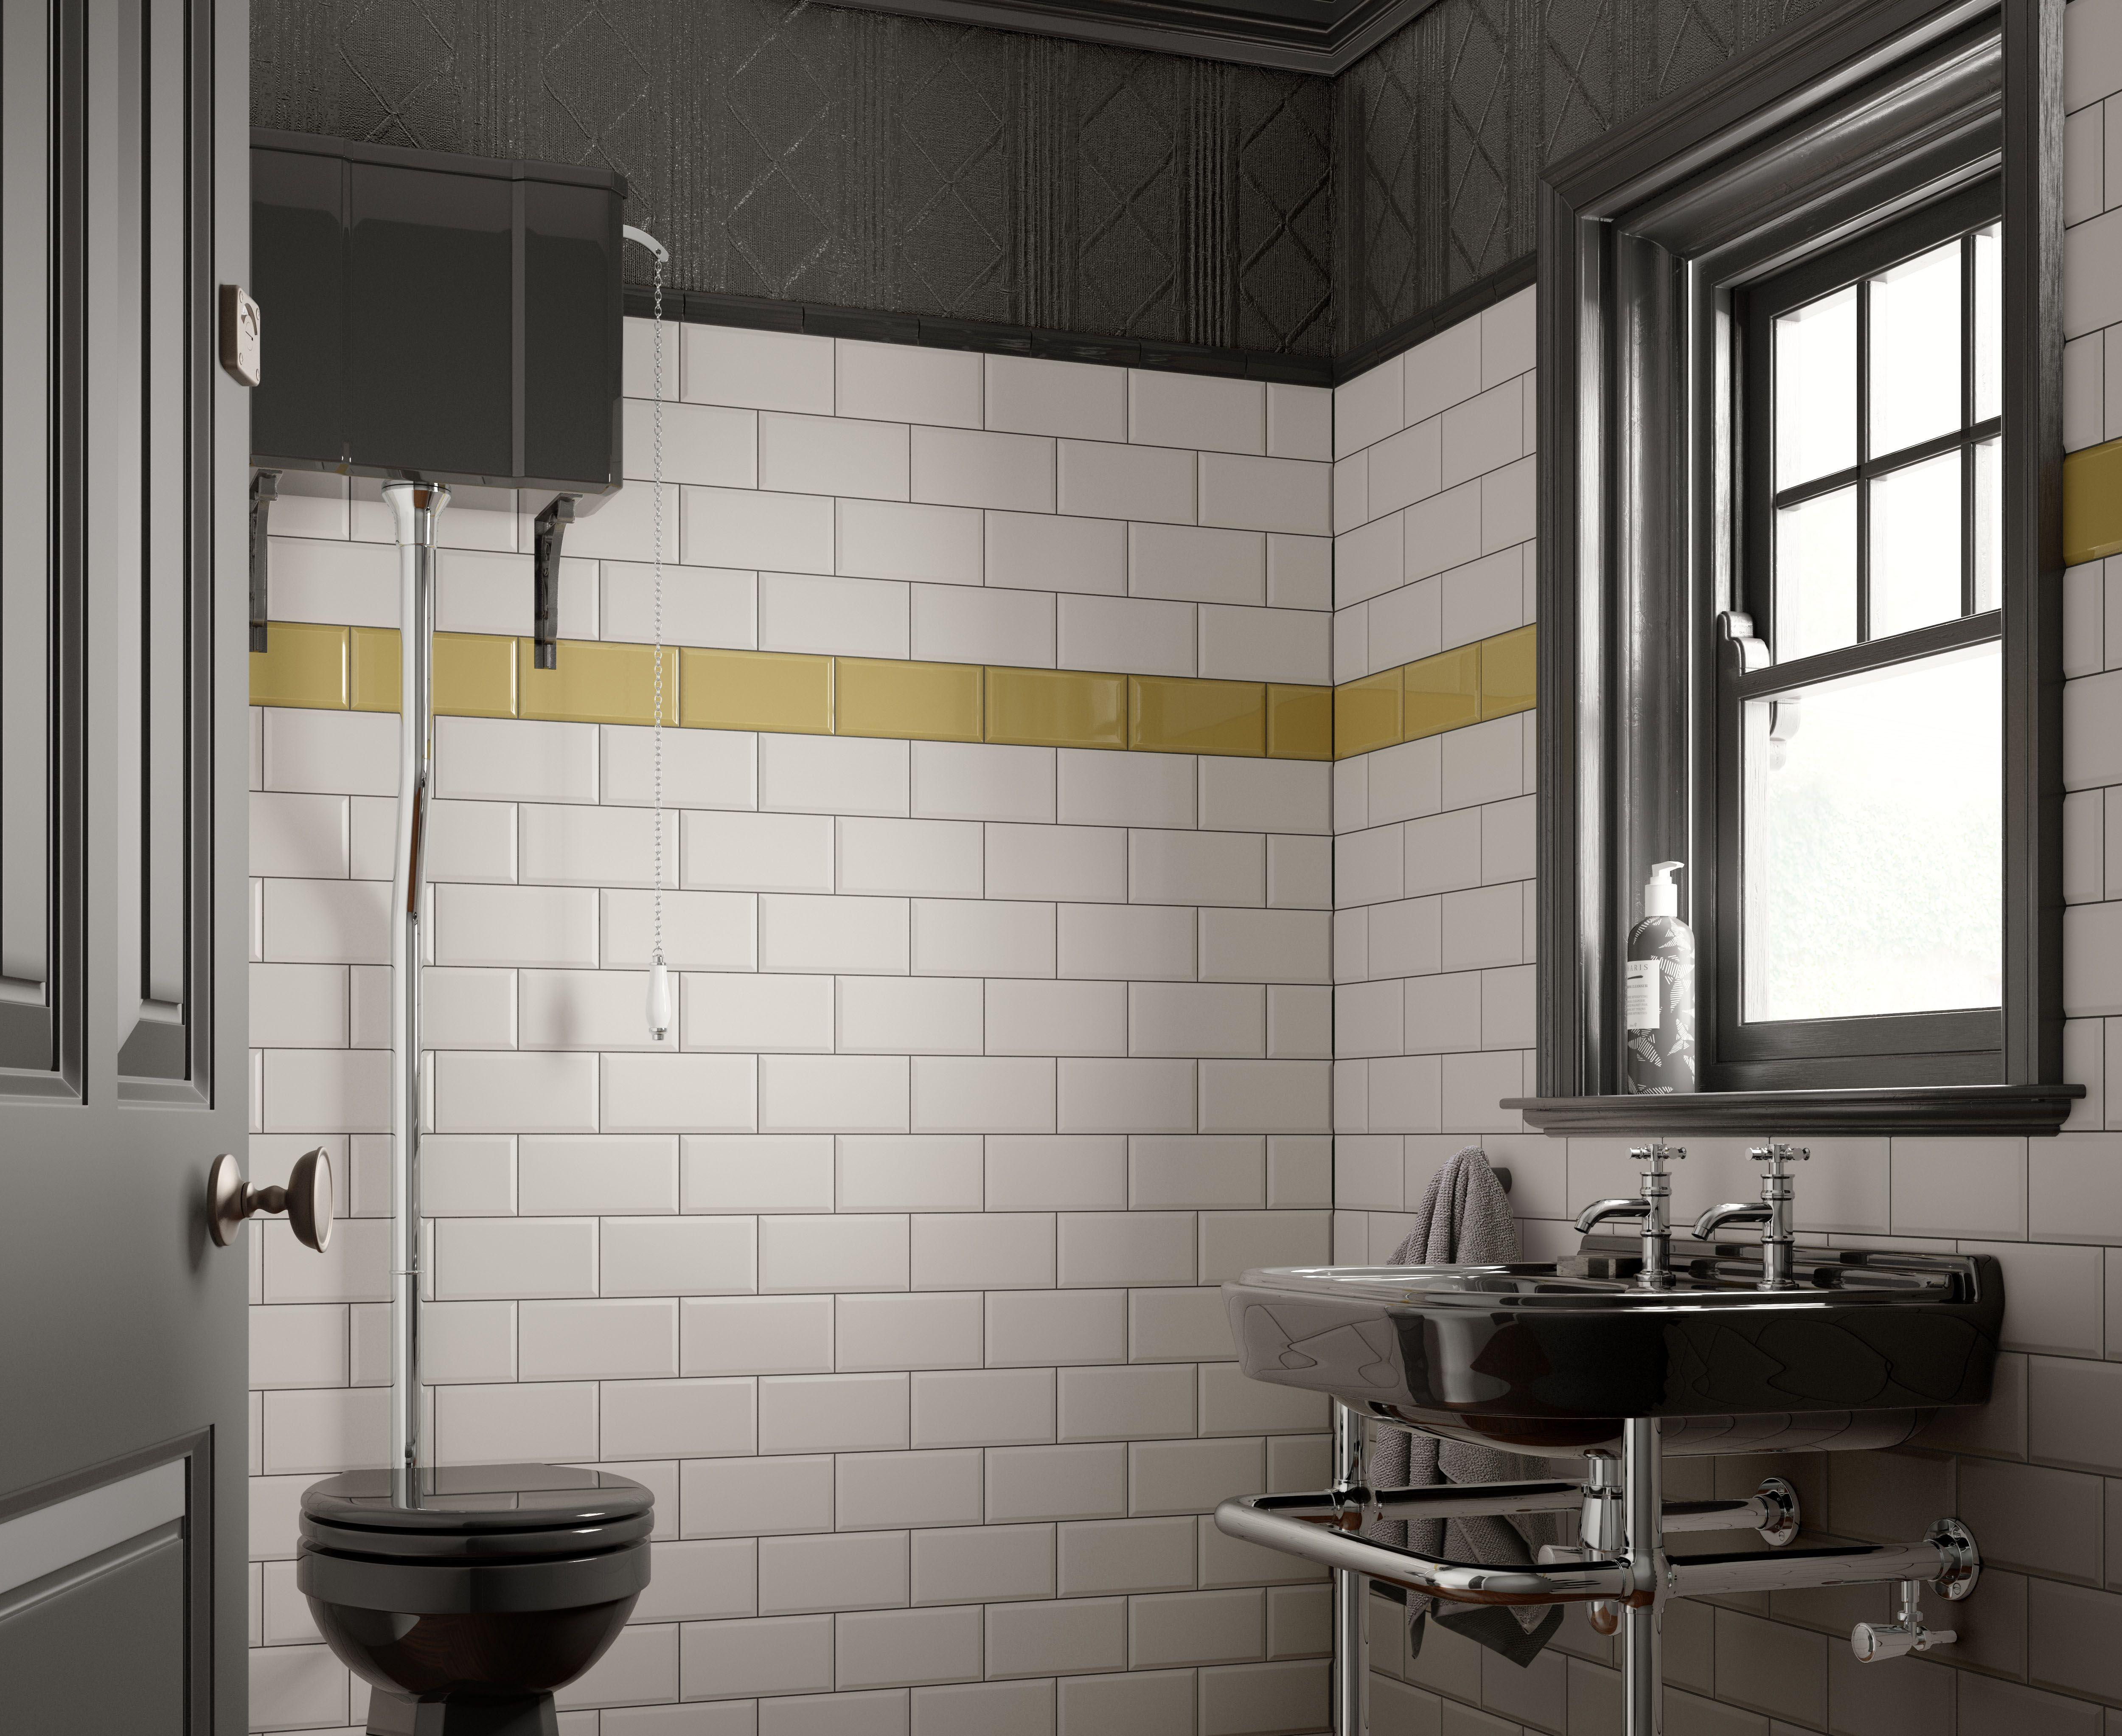 Deep Metro White Tile Spring Sale Bathroom Diyweekend Tile Cheap Bathrooms Wall Tiles Bathroom Wall Tile